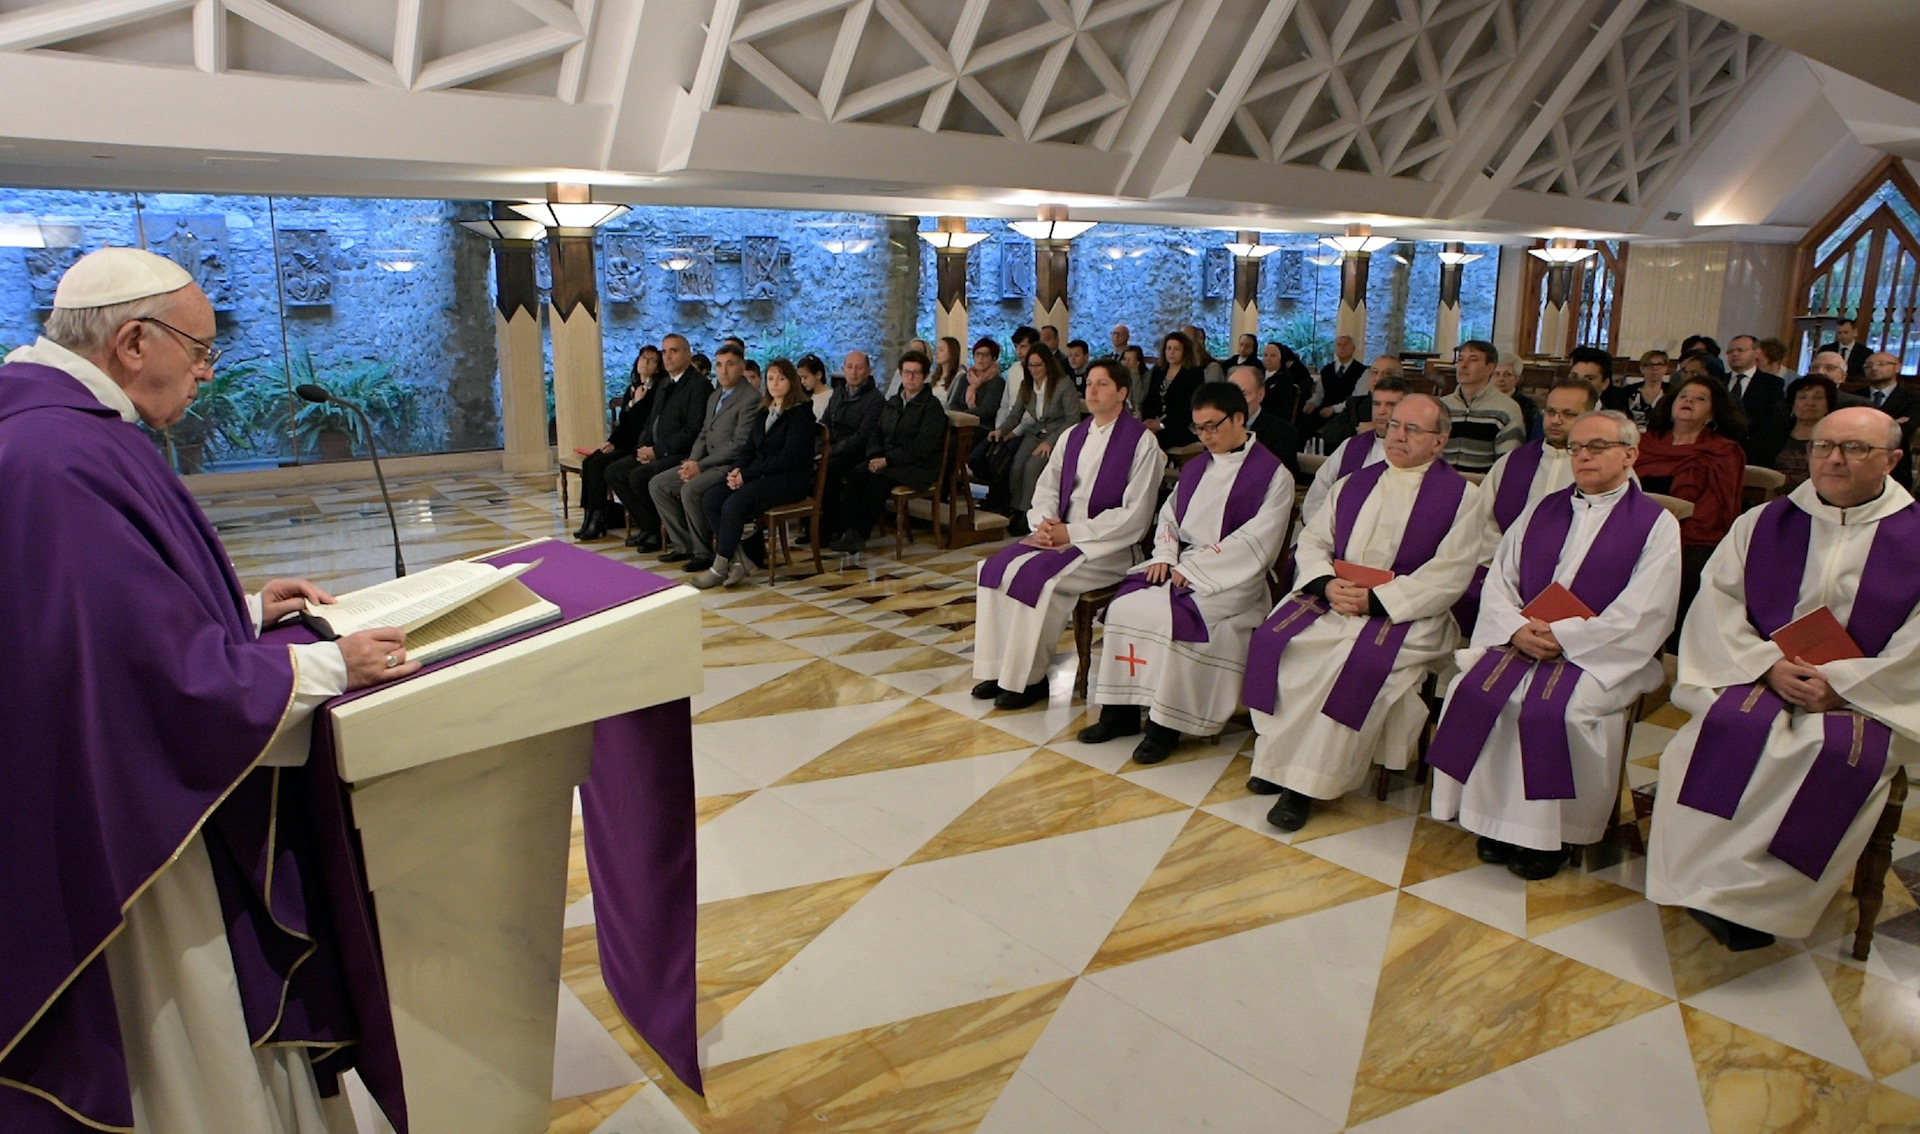 Misa en Sta. Marta. 4 de abril de 2017. (Foto Osservatore © Romano)